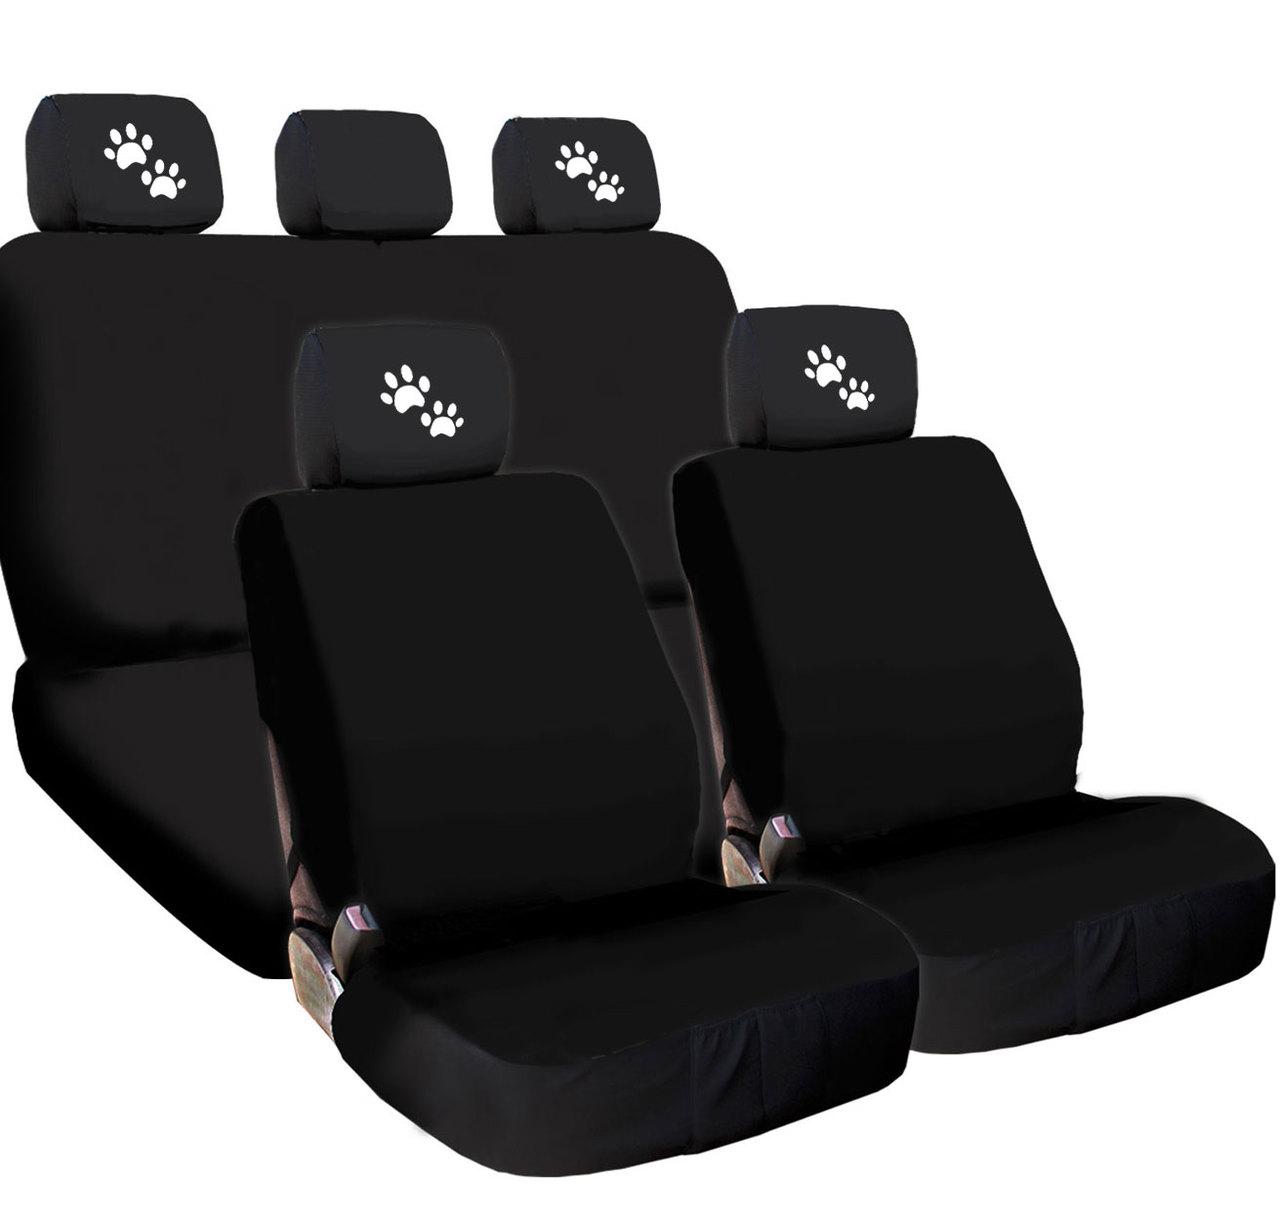 New Design 4X Paws Logo Accessories Headrest w/ Black Cloth Car Seat Covers